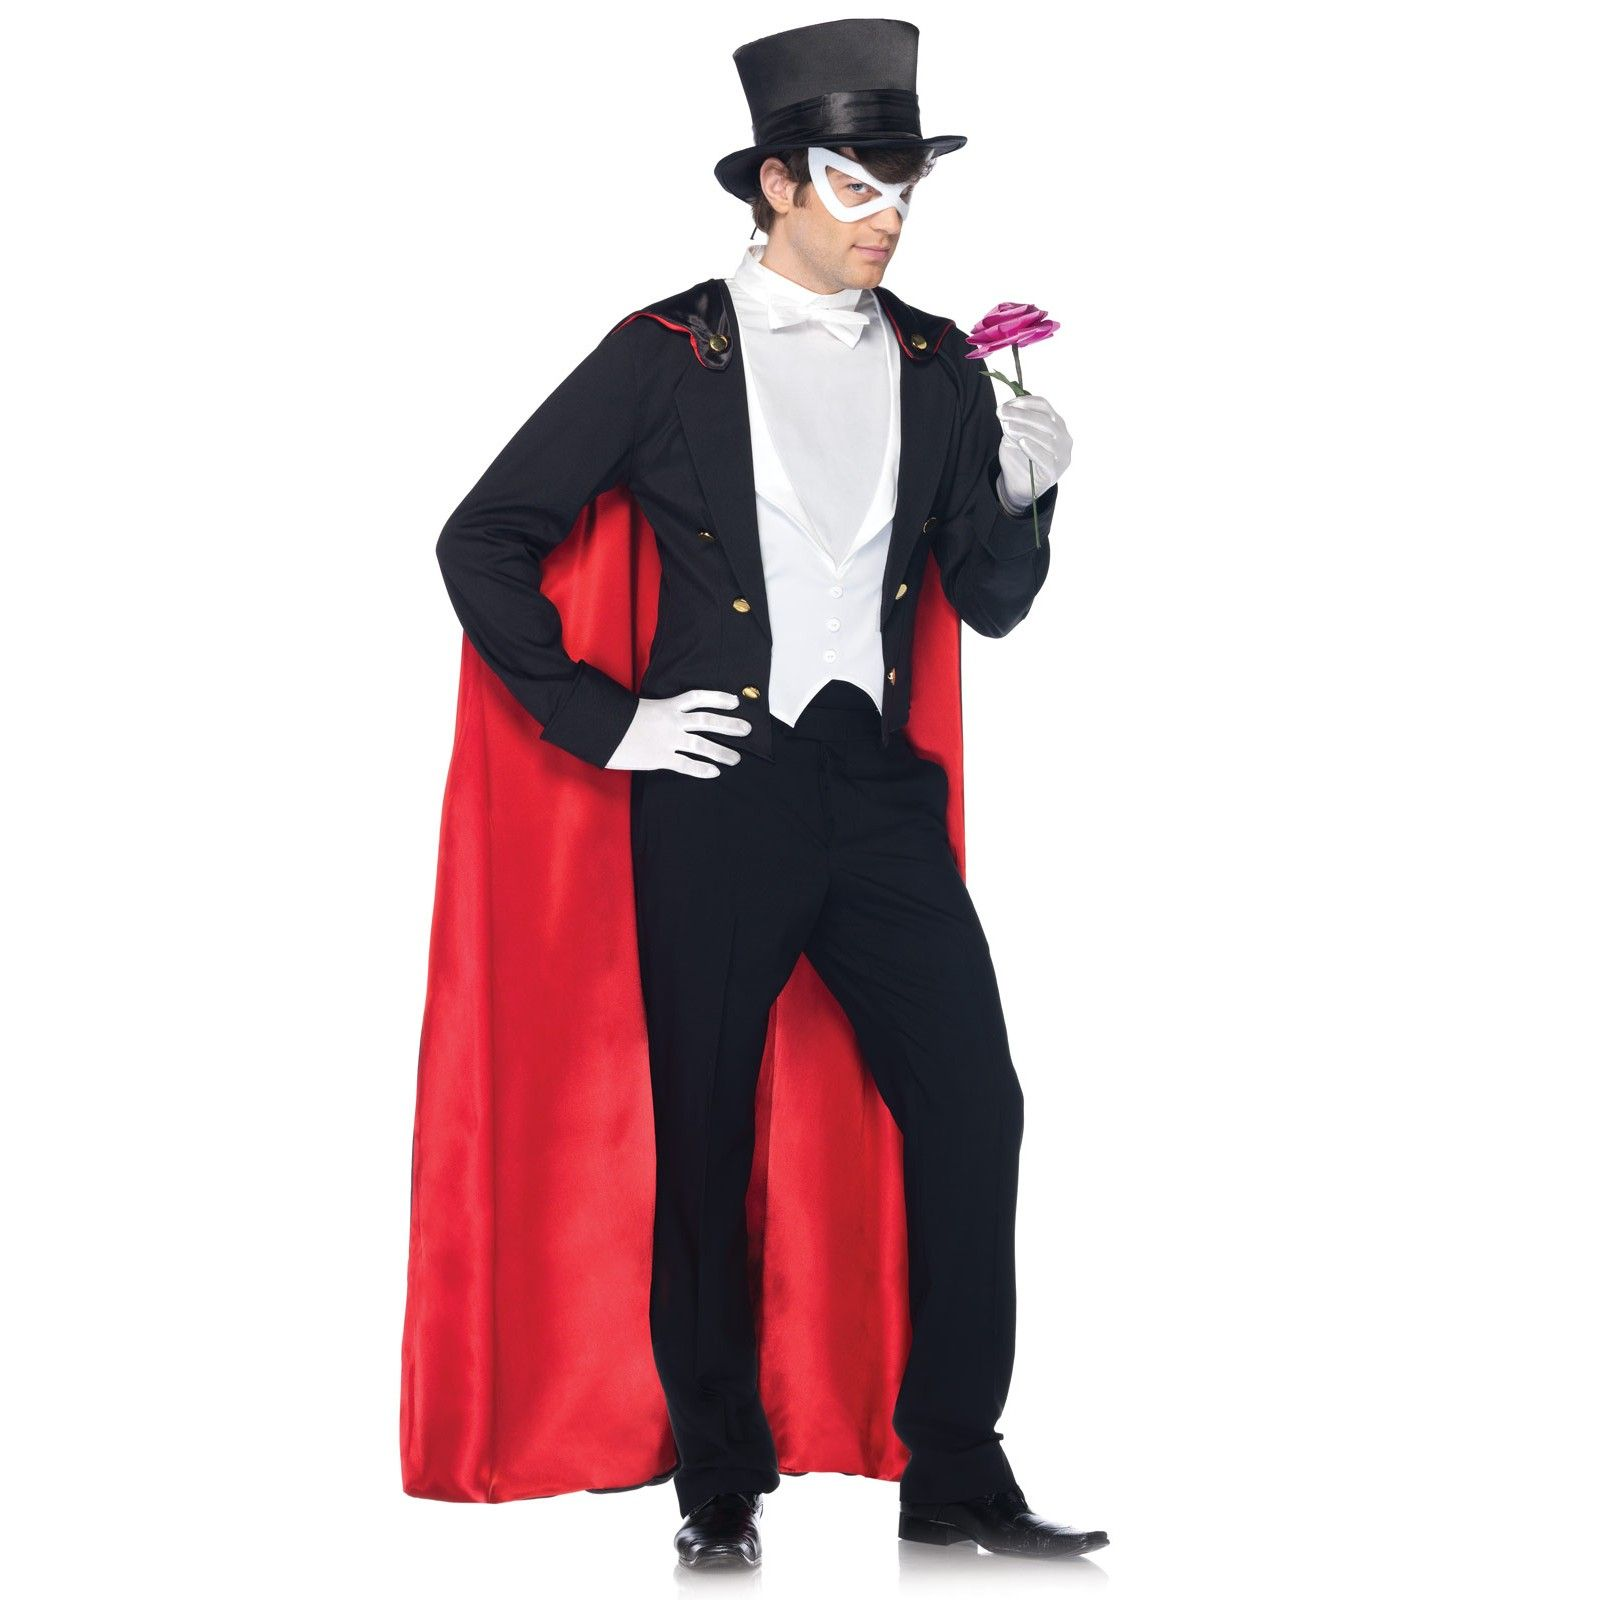 Vintage Hollywood Man's Tuxedo Adult Costume | Tuxedo mask, Sailor ...